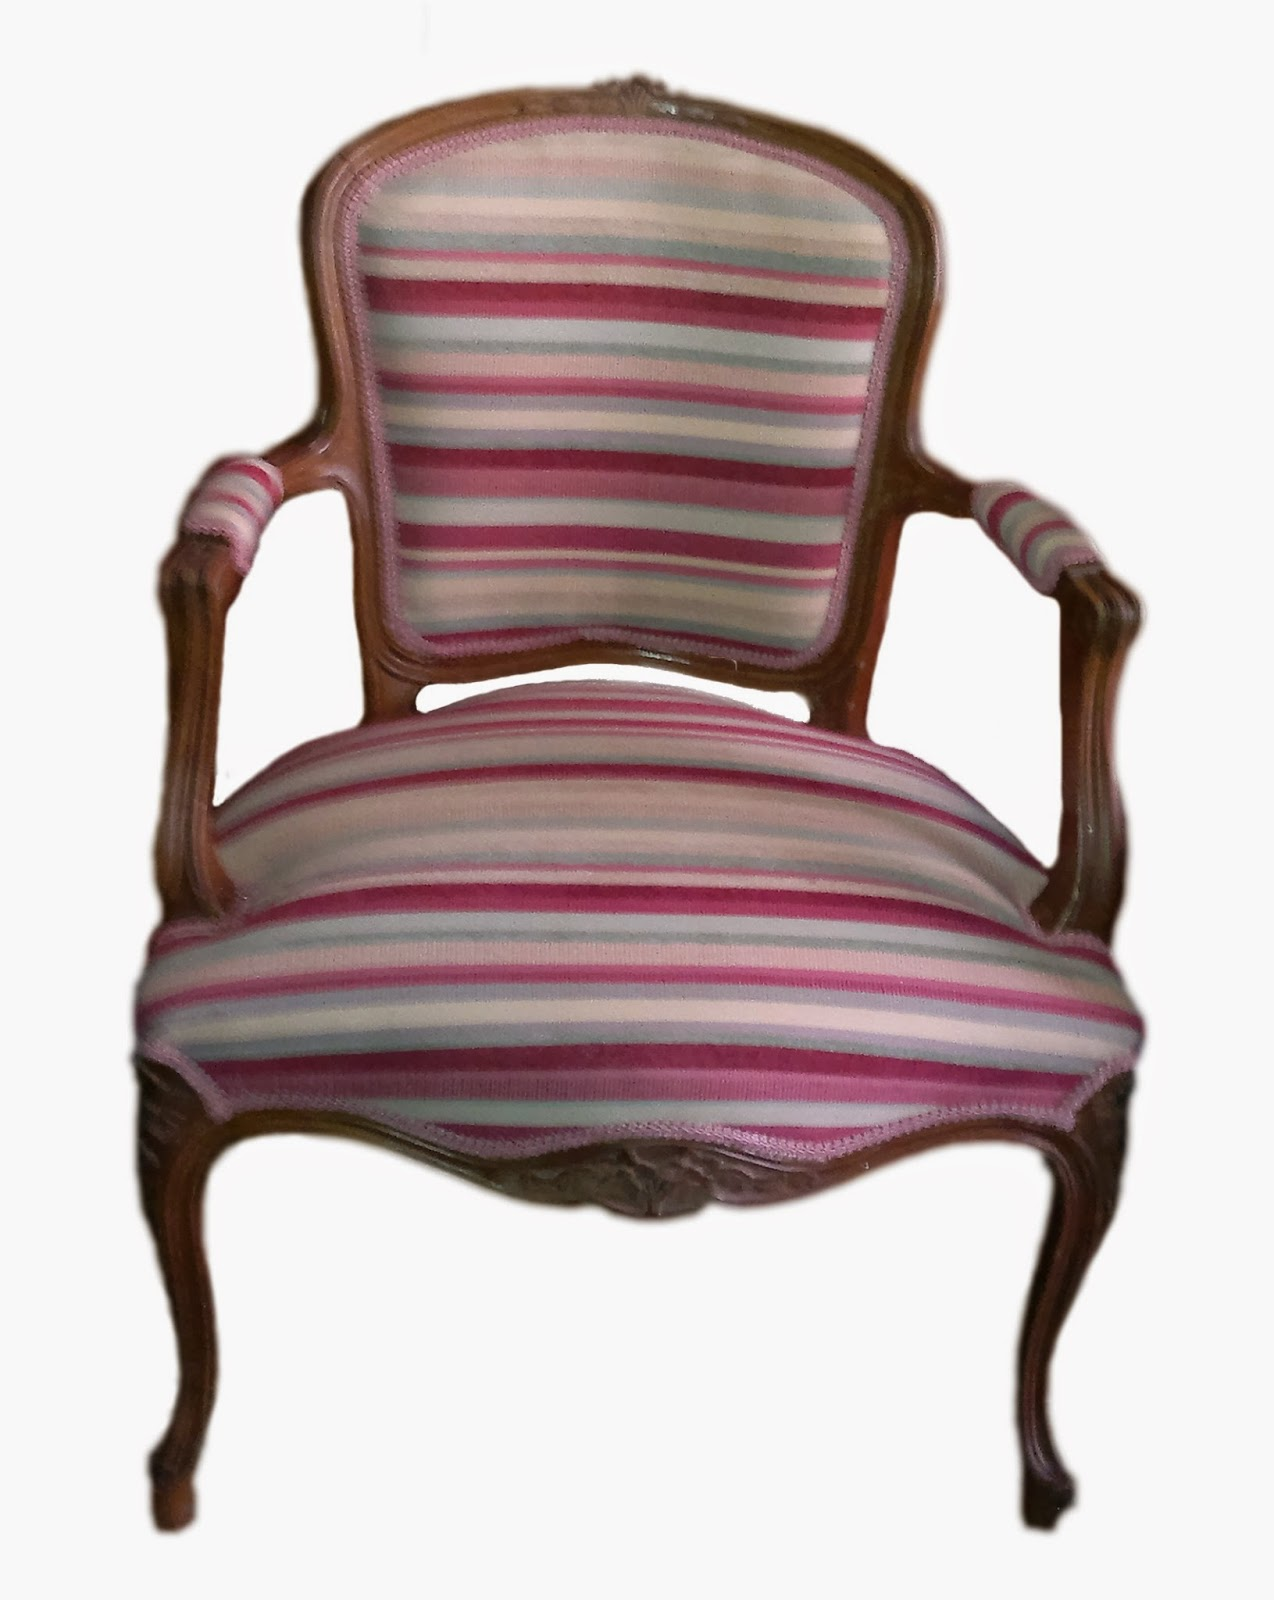 Tapicer a carrasco asturias sillones luis xv rococ for Muebles carrasco